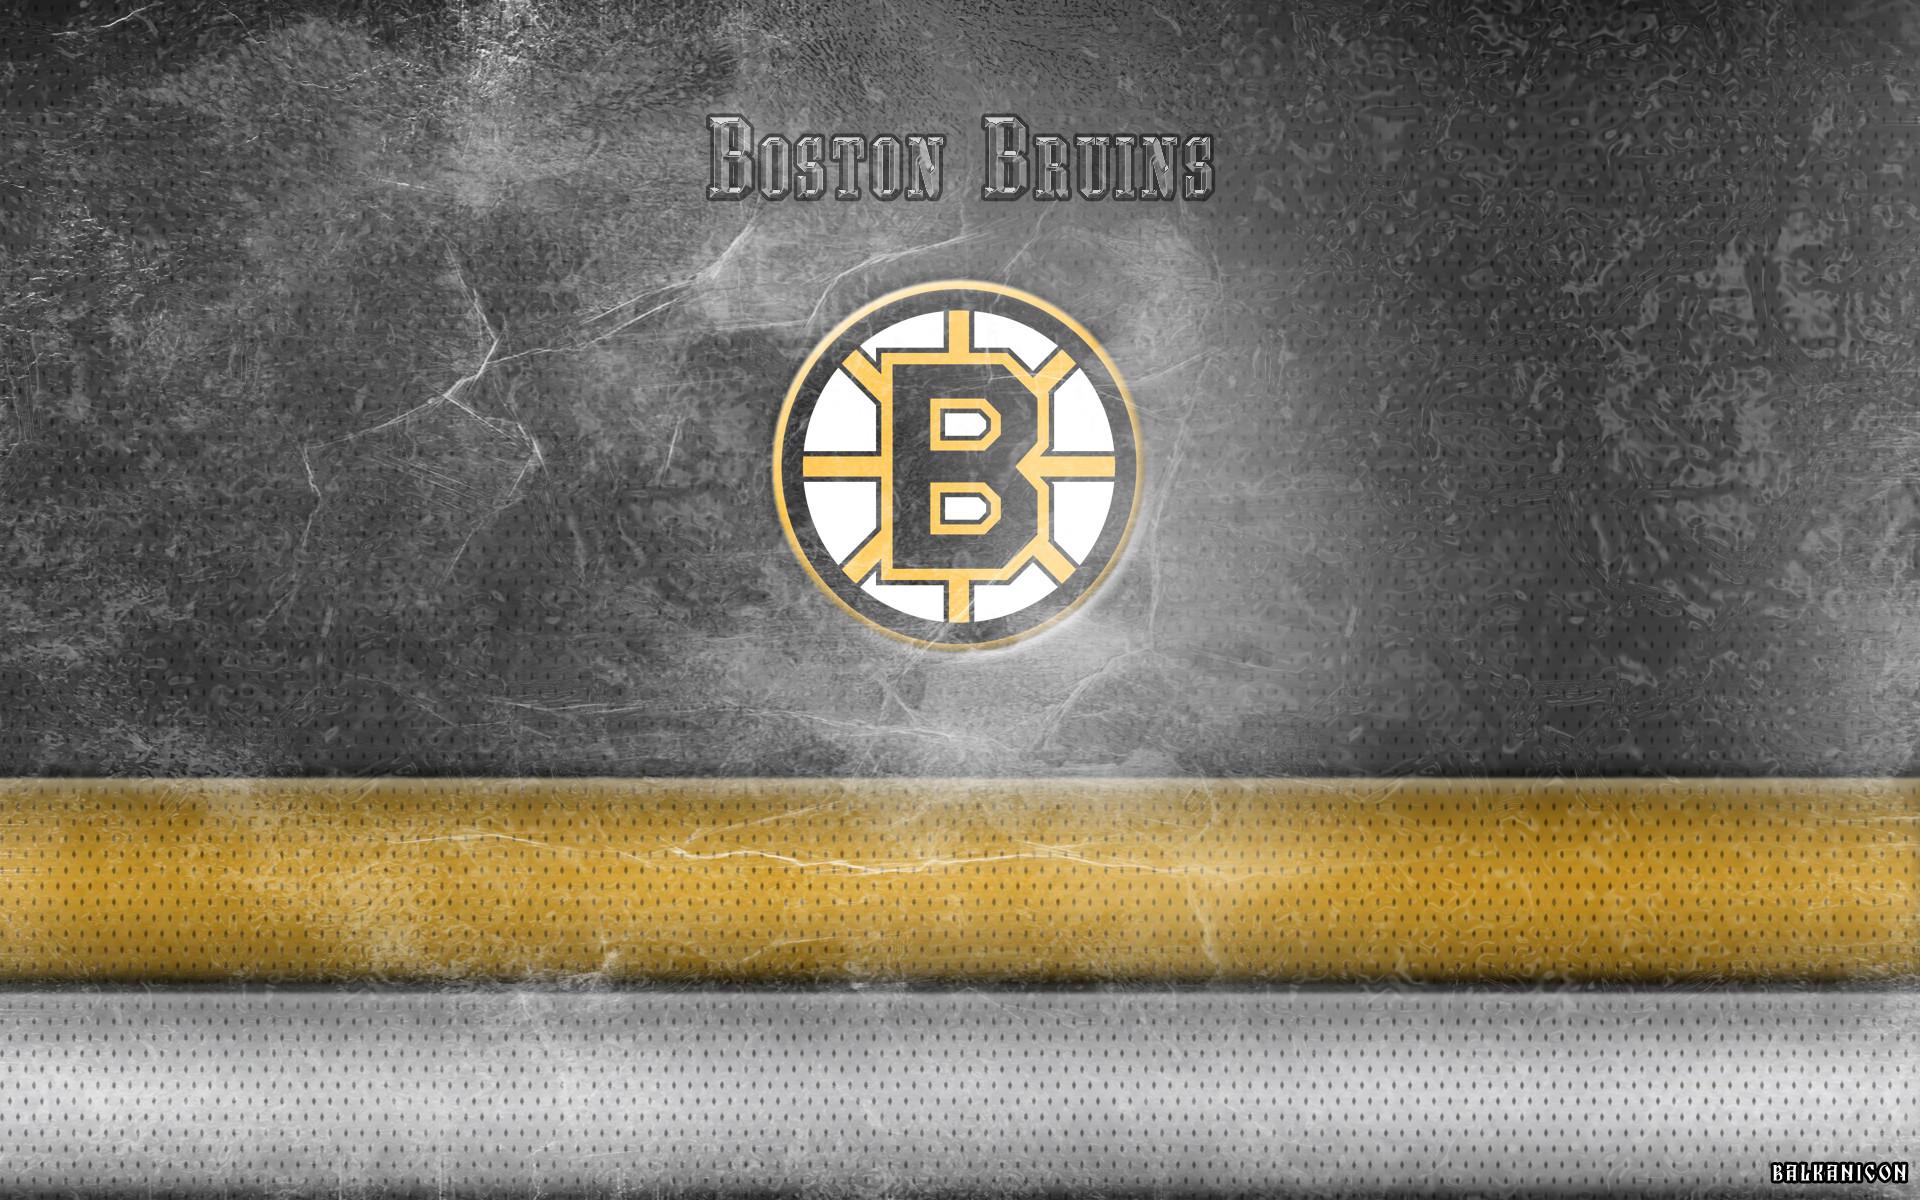 Boston Bruins wallpaper by Balkanicon Boston Bruins wallpaper by Balkanicon